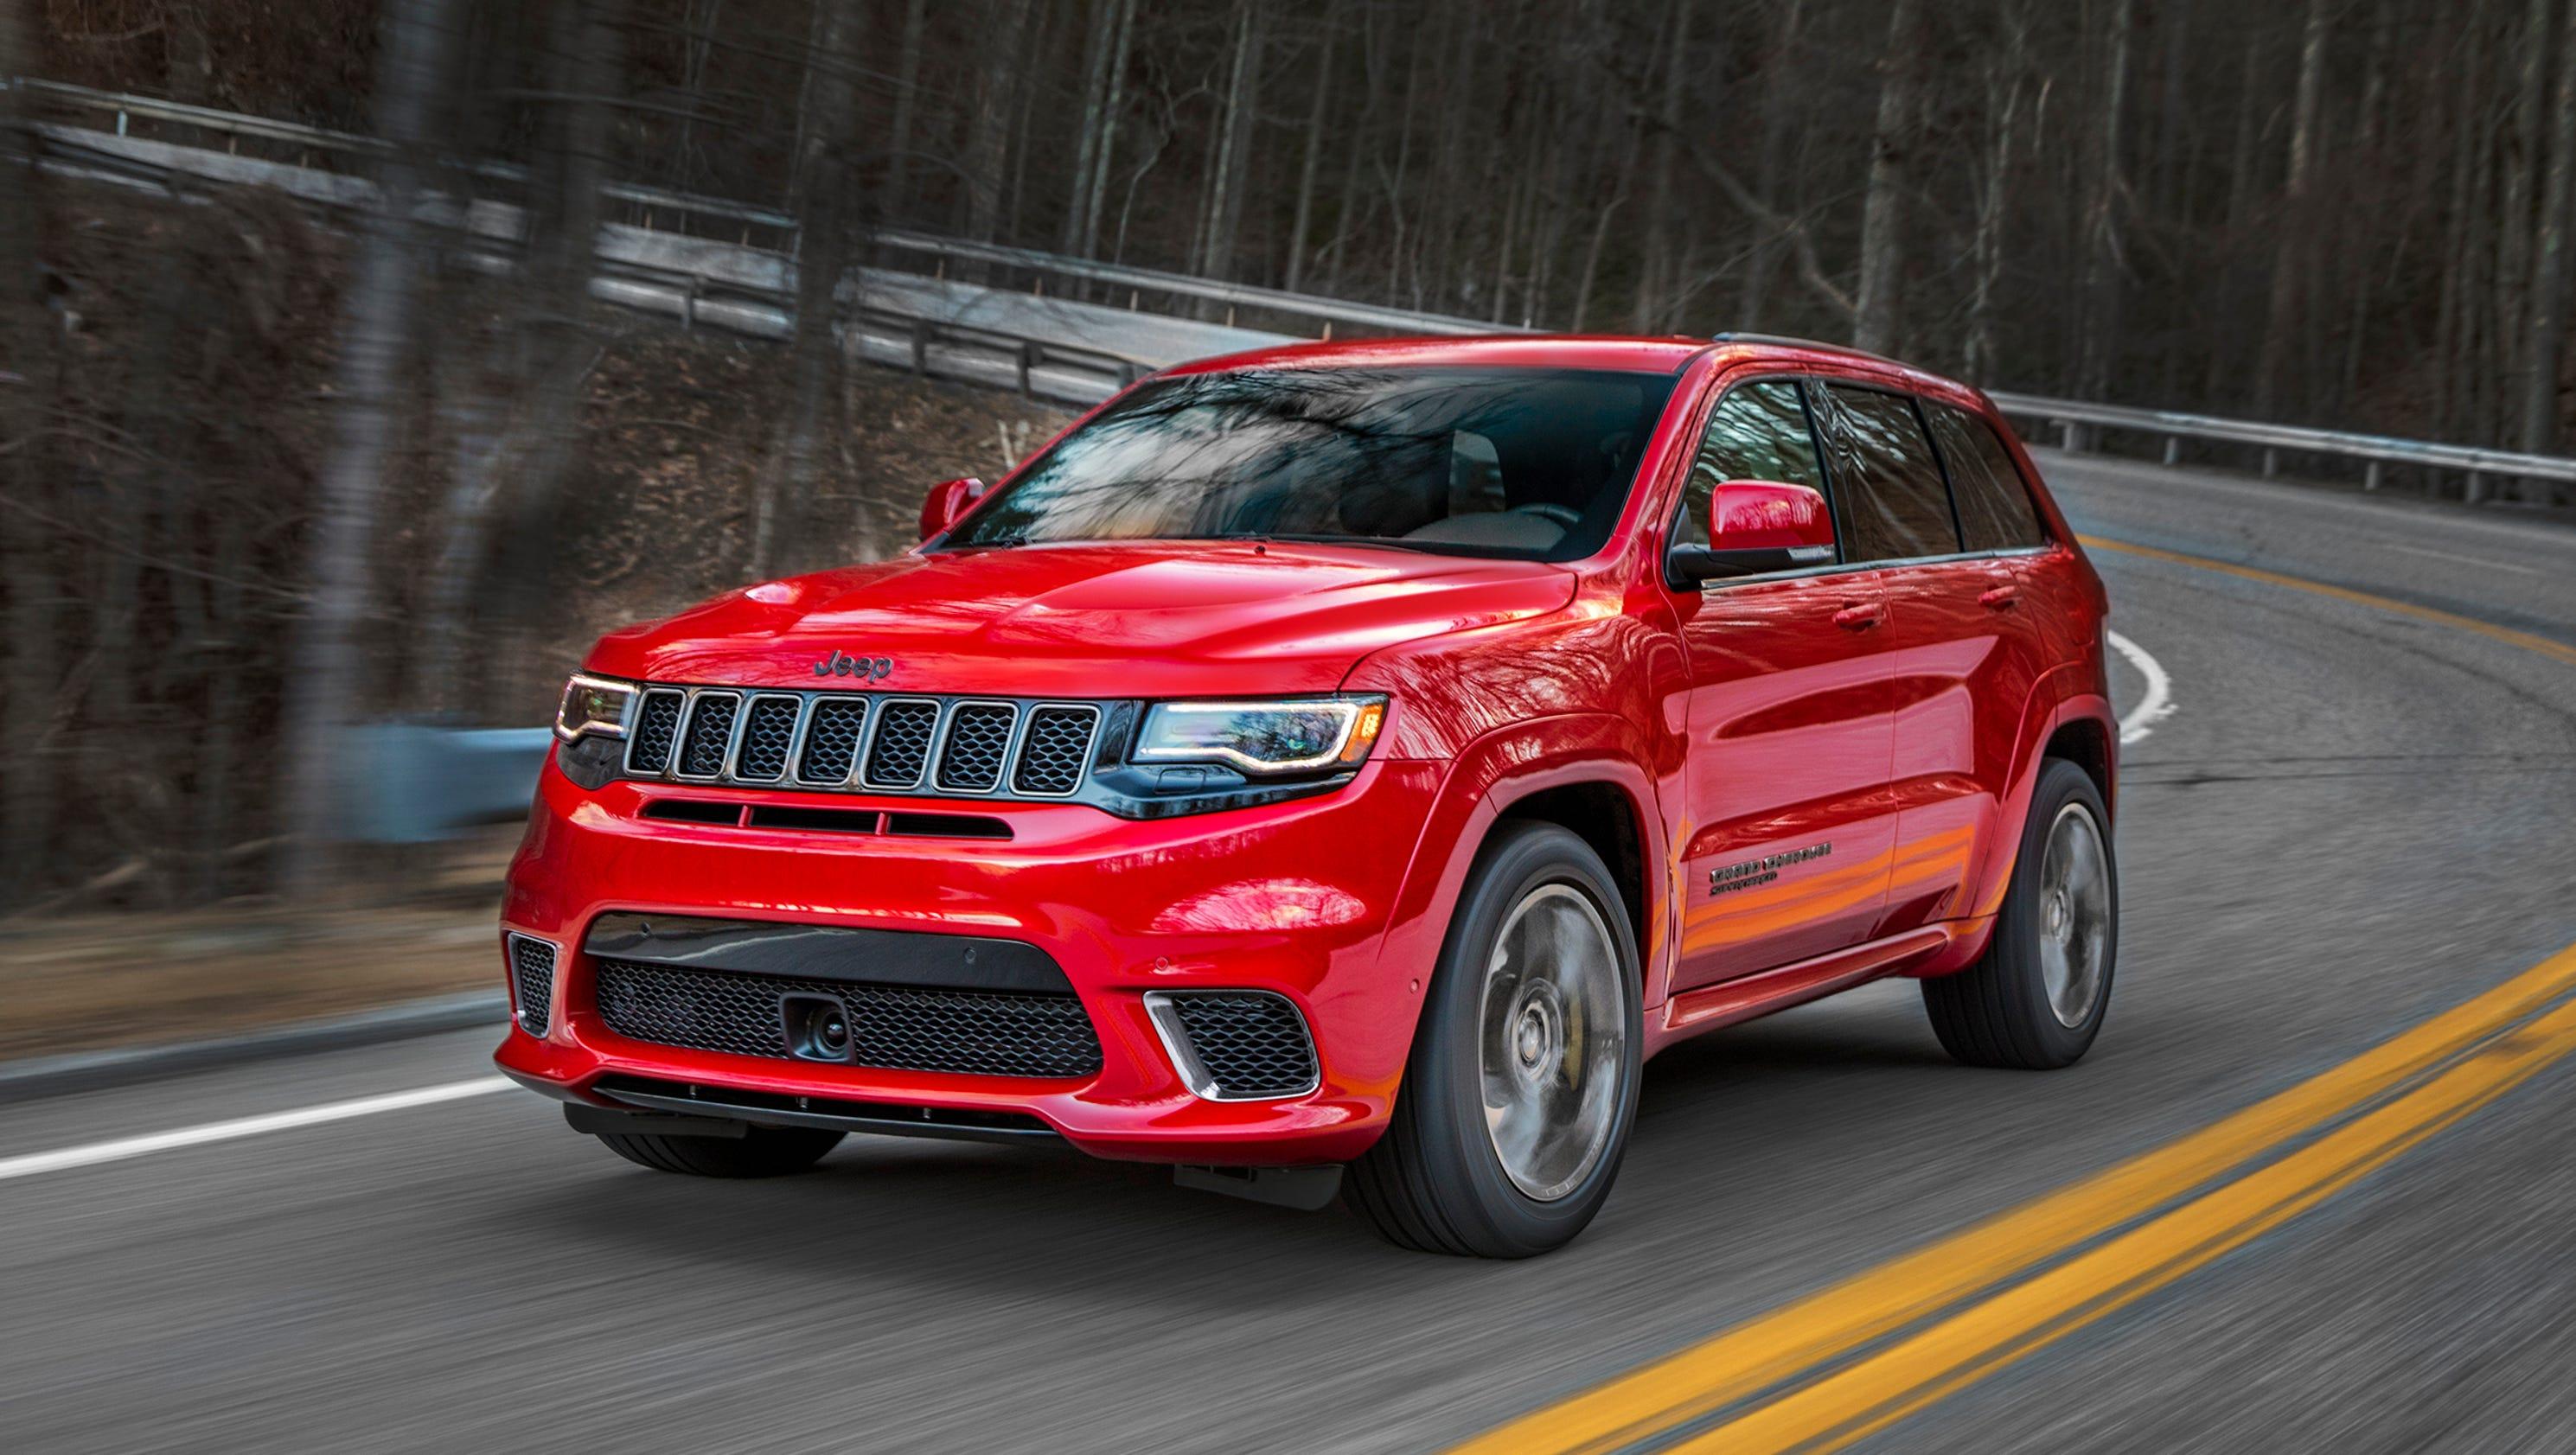 2018 Jeep Grand Cherokee Trackhawk Hellcat >> Jeep drops Hellcat engine into Grand Cherokee Trackhawk